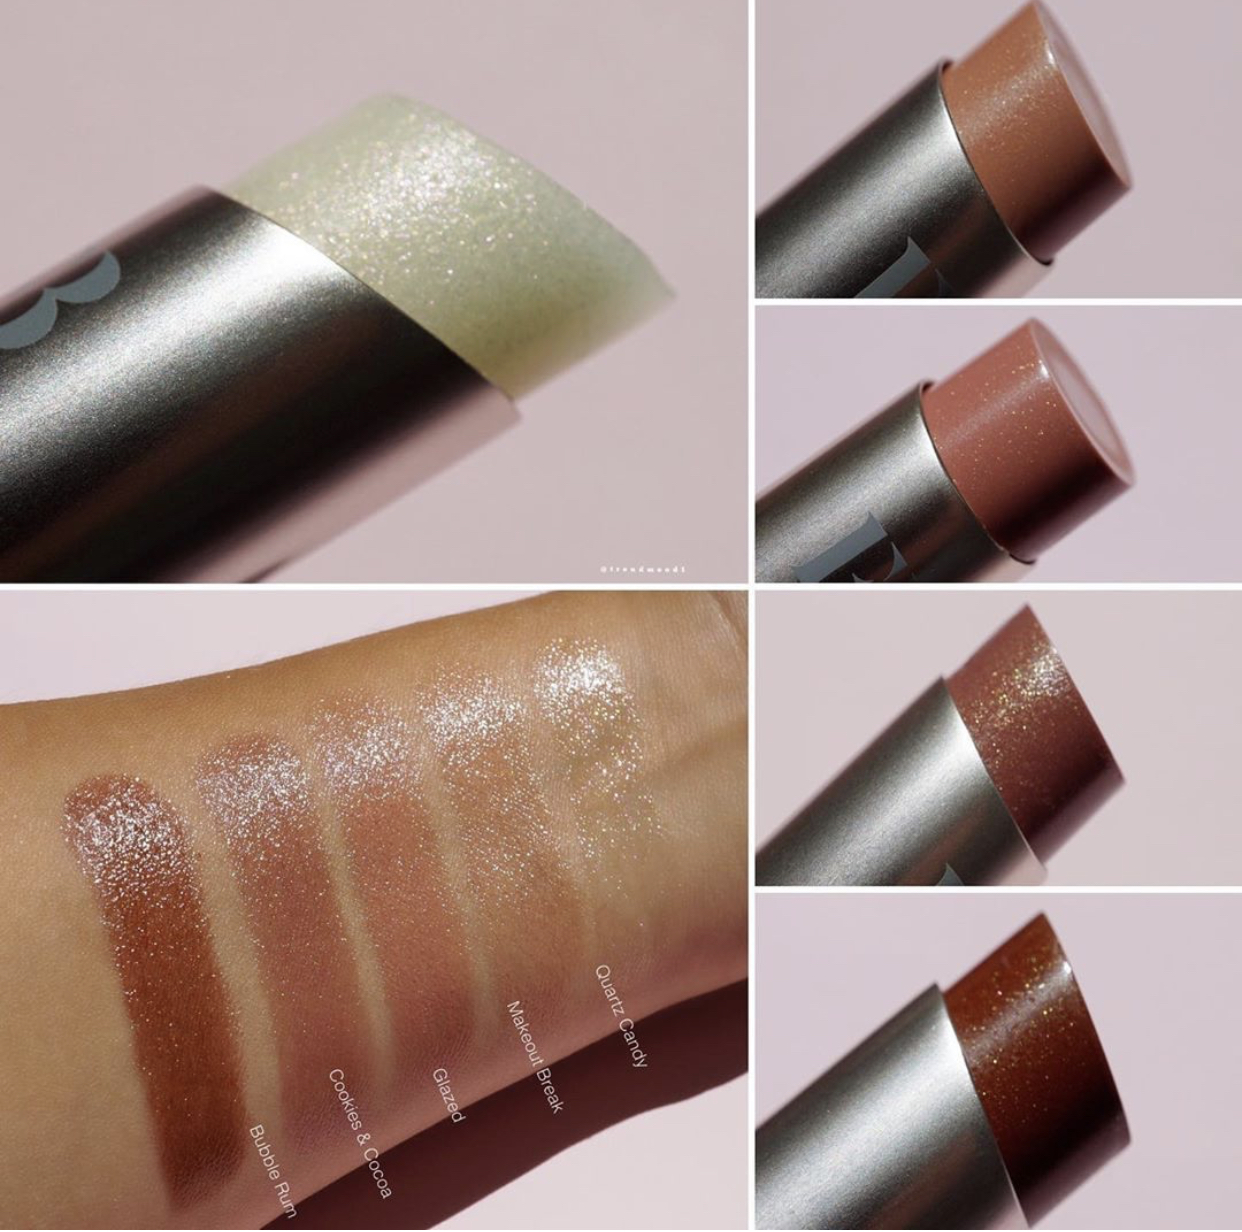 Fenty Beauty Slip Shine Sheer Shiny Lipstick Collection